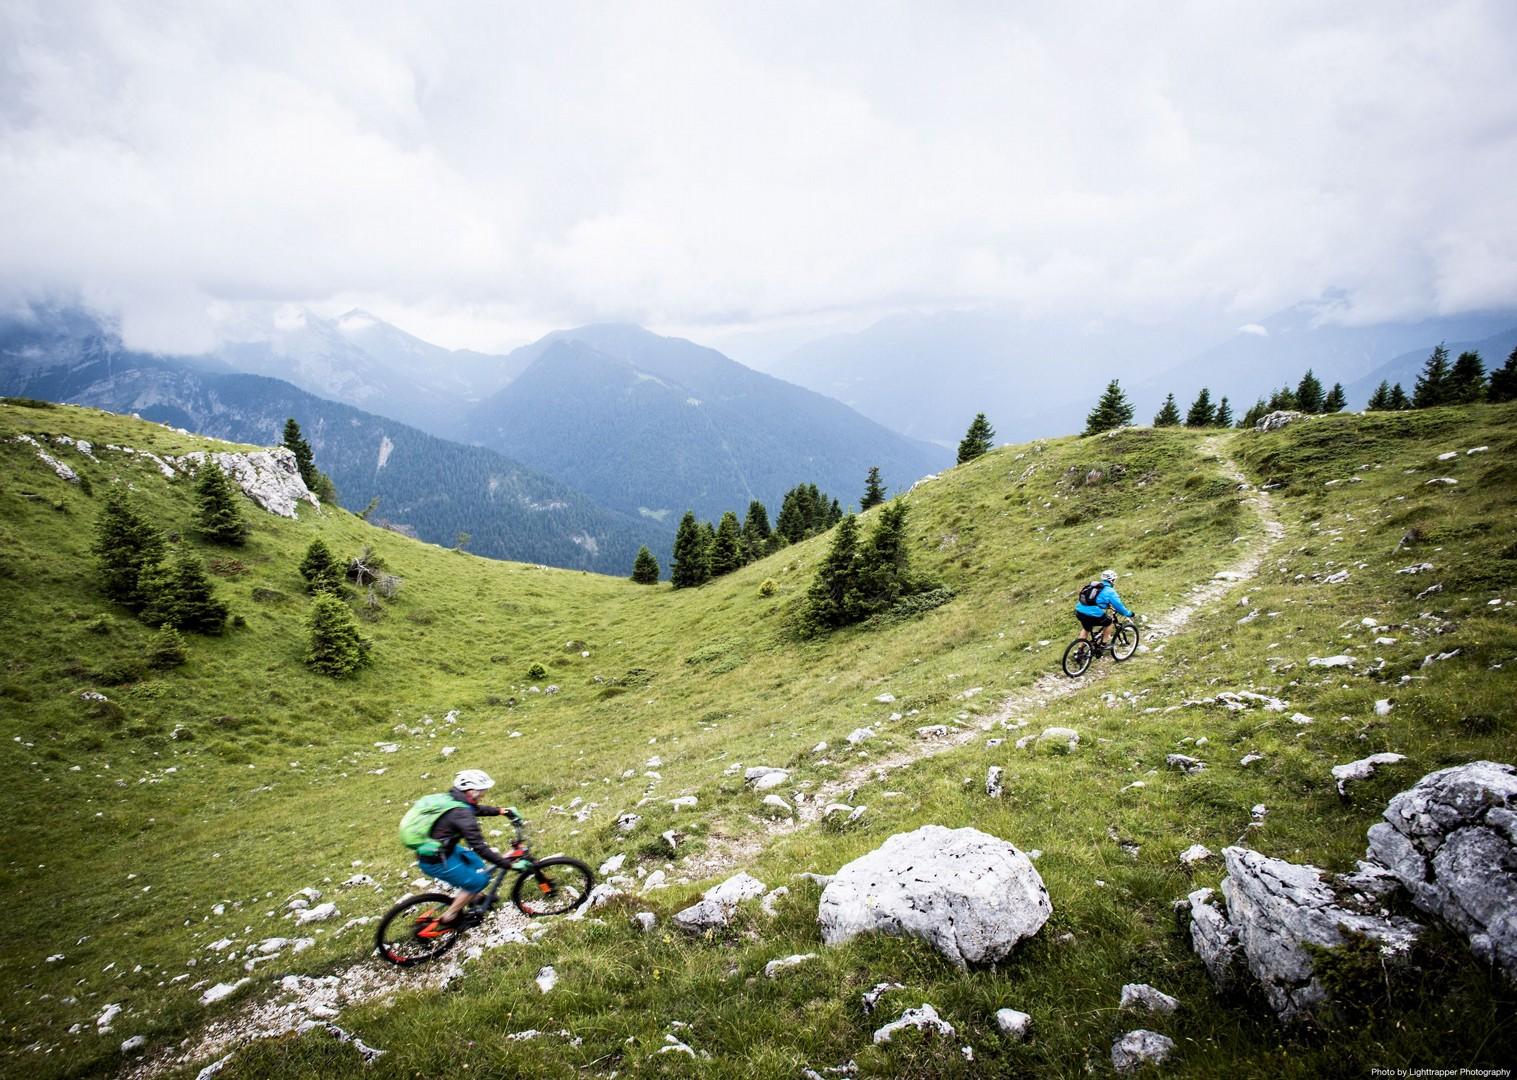 saddle_skedaddle_italy_2017_day6_brenta_dolomites_205.jpg - Italy and France - Alpine Adventure - Guided Mountain Bike Holiday - Mountain Biking